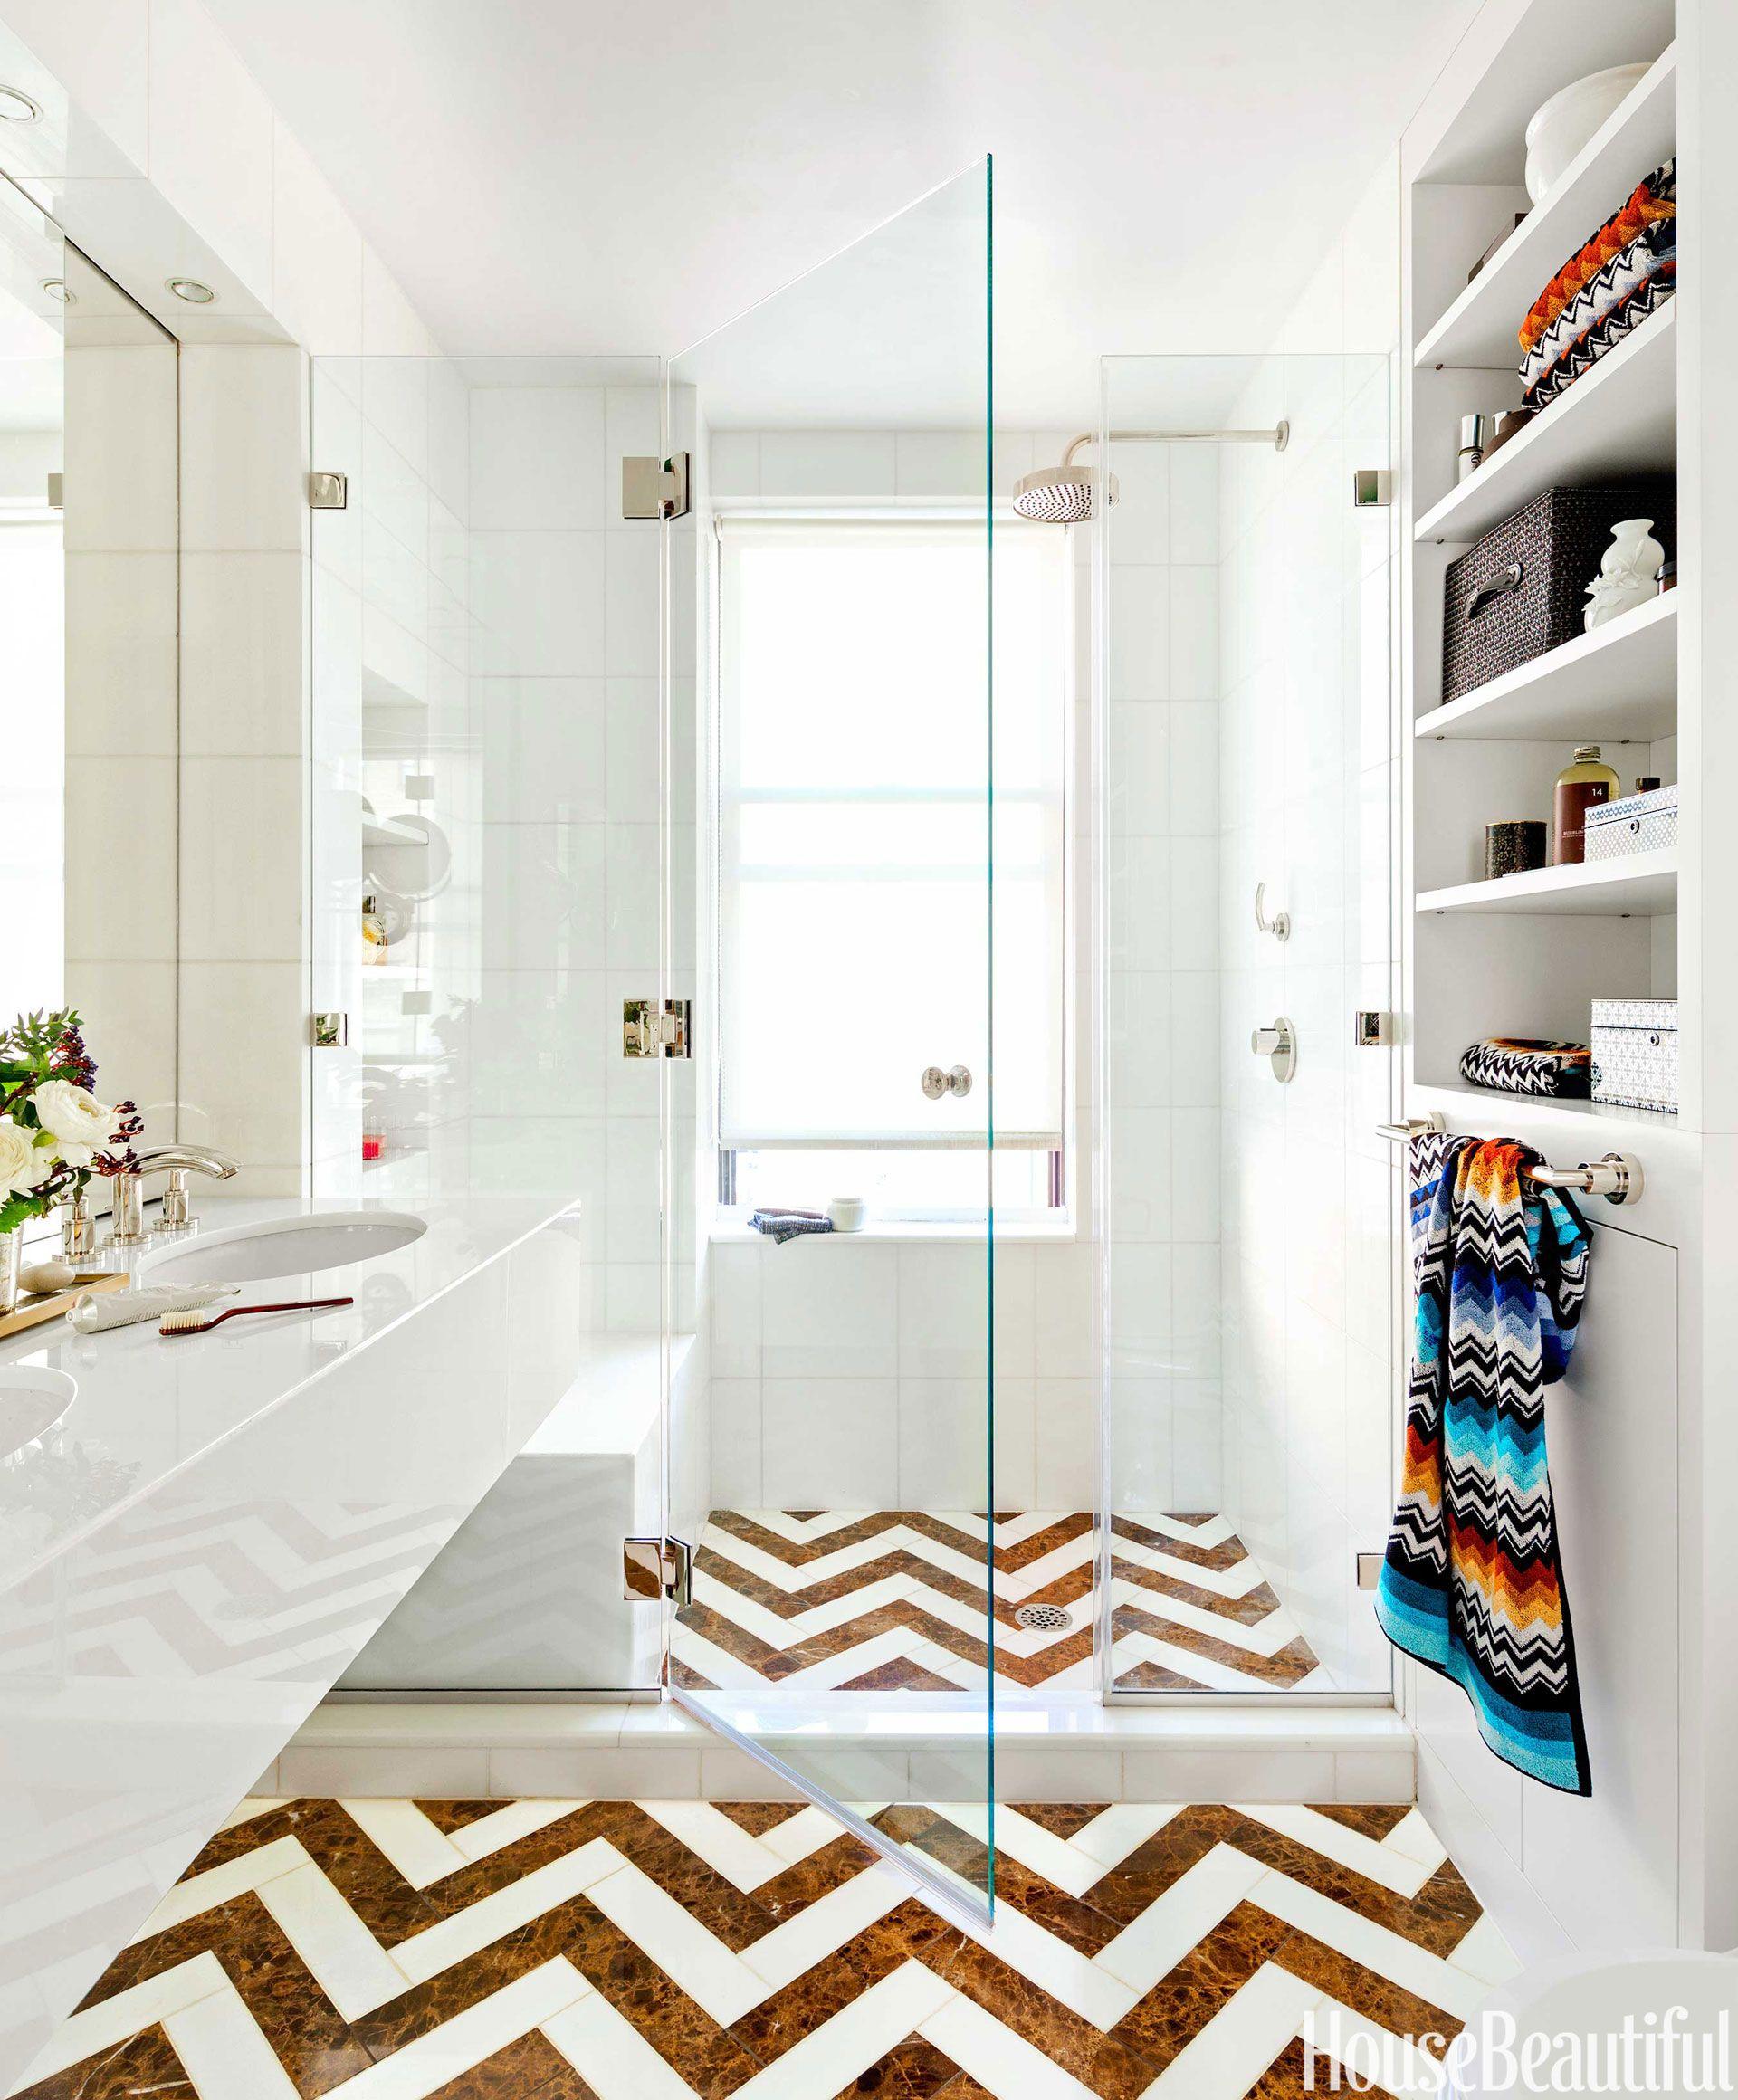 Chevron Bathroom Tile - Chevron Floor